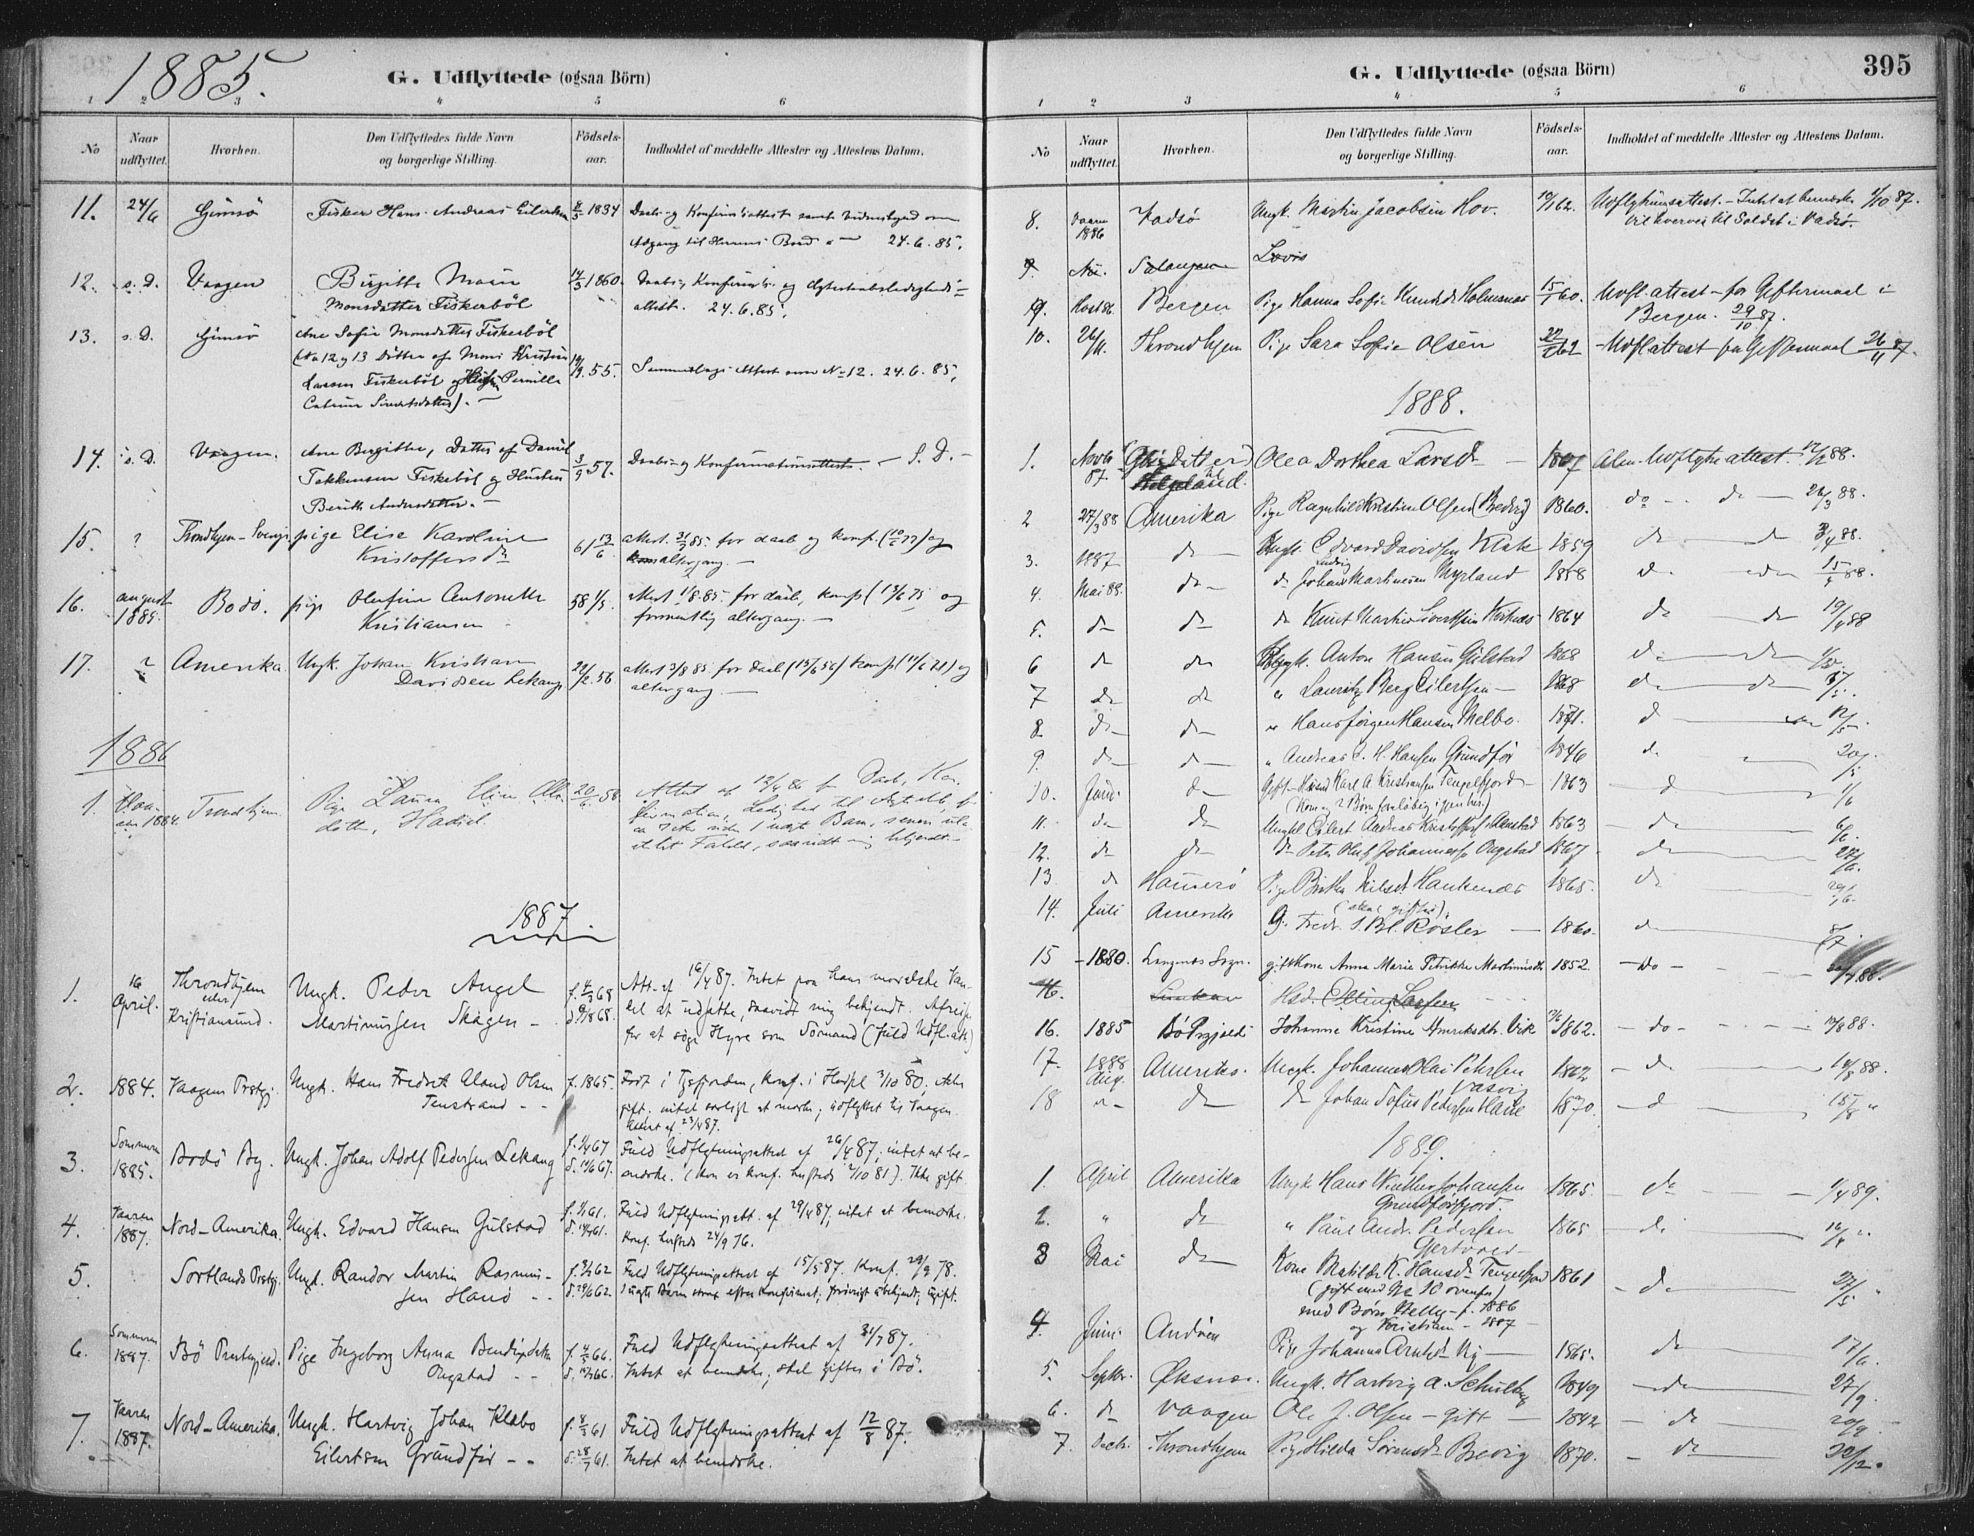 SAT, Ministerialprotokoller, klokkerbøker og fødselsregistre - Nordland, 888/L1244: Ministerialbok nr. 888A10, 1880-1890, s. 395